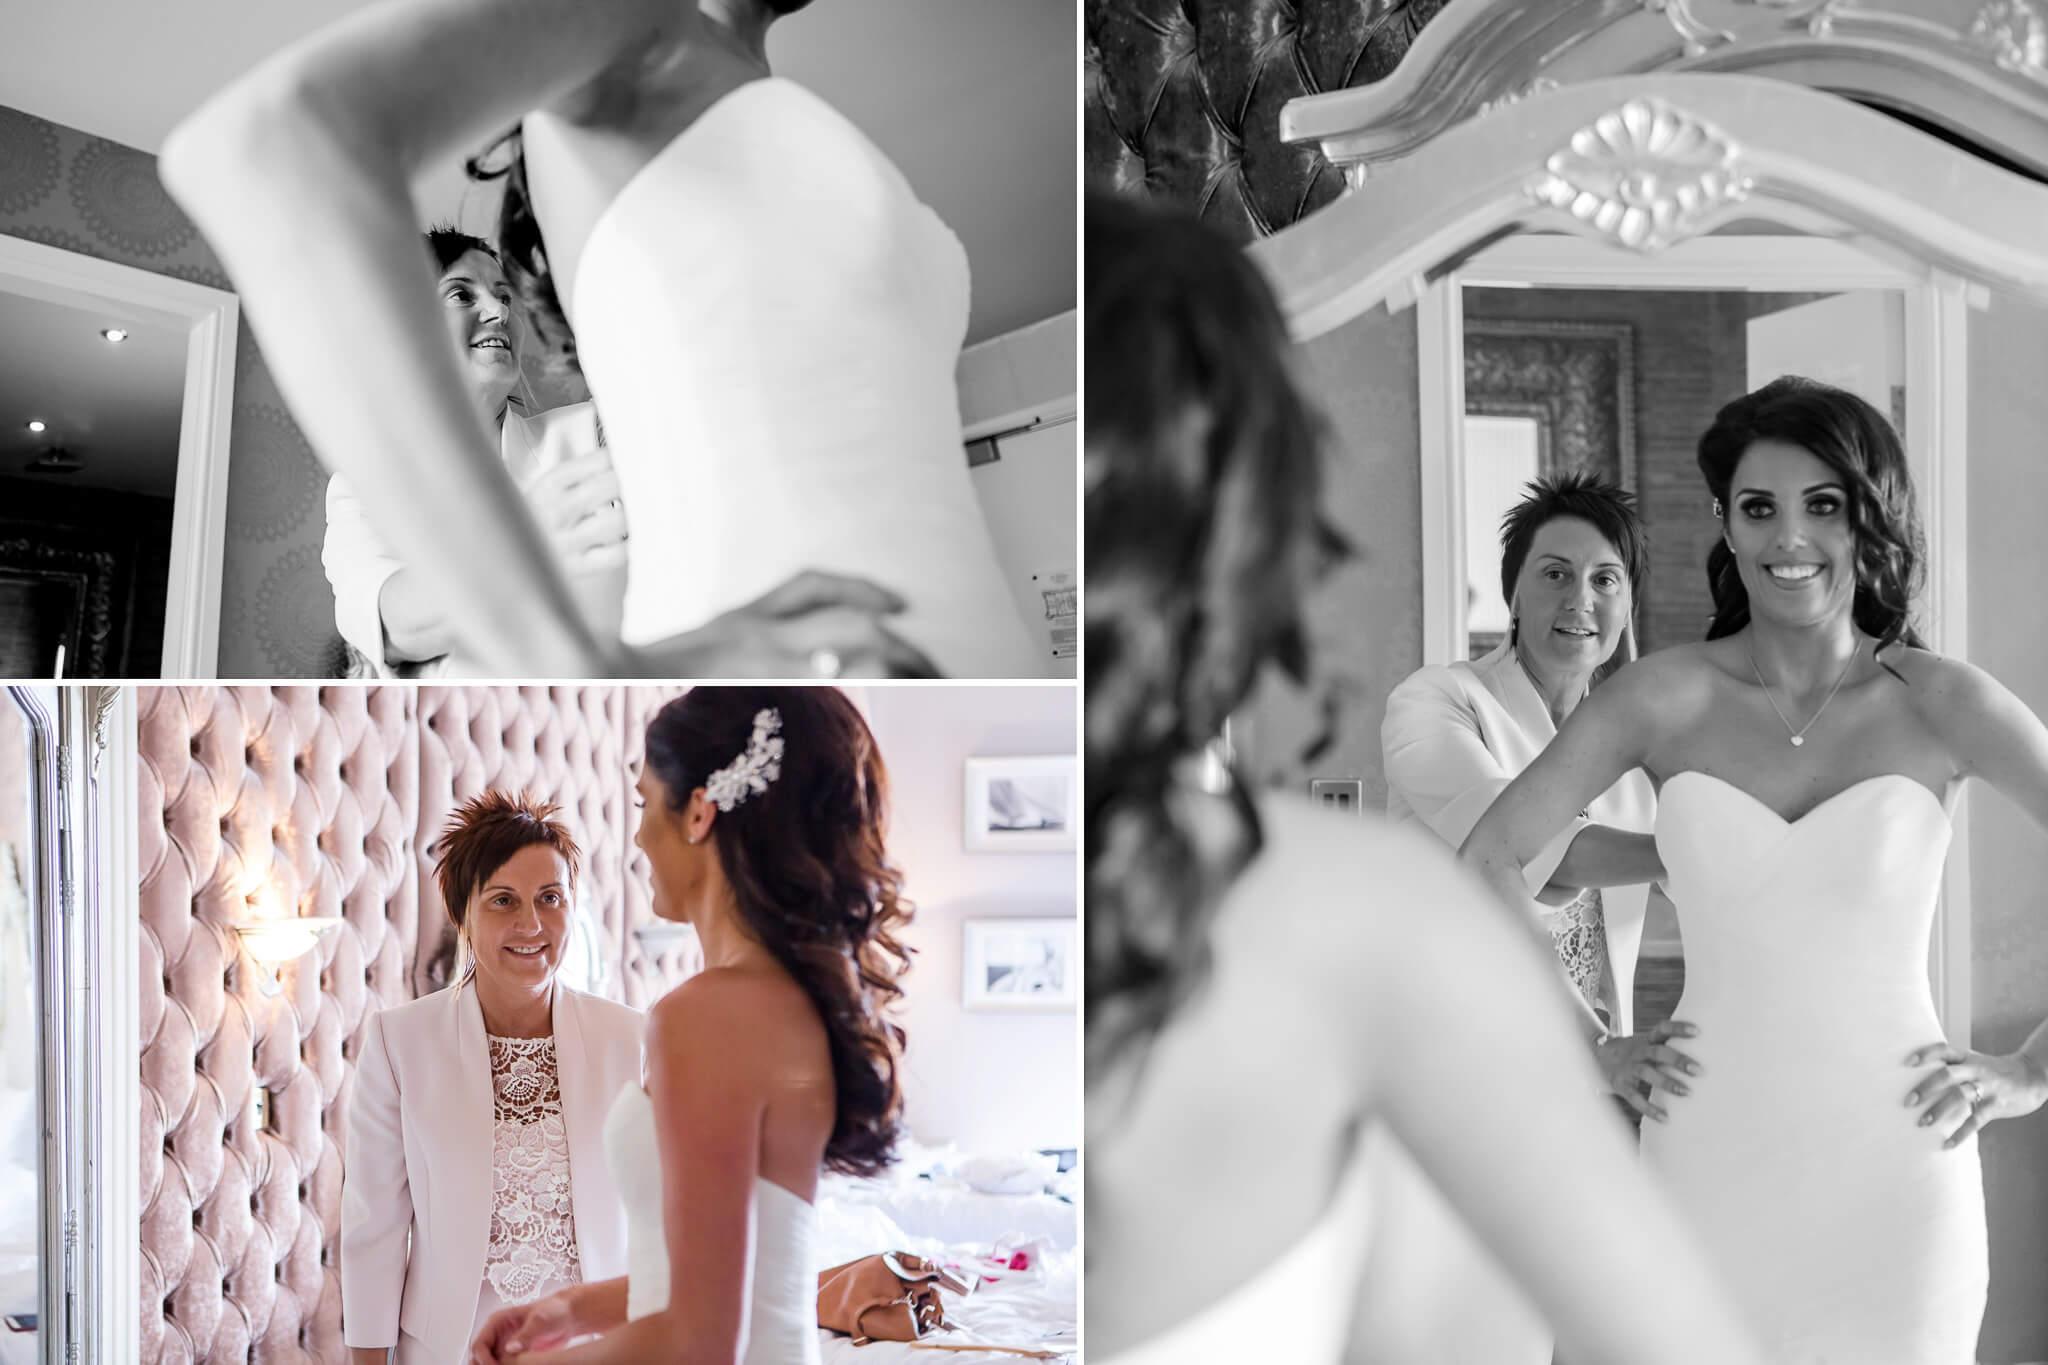 mother-of-the-bride-wedding-dress-celebration-liverpool